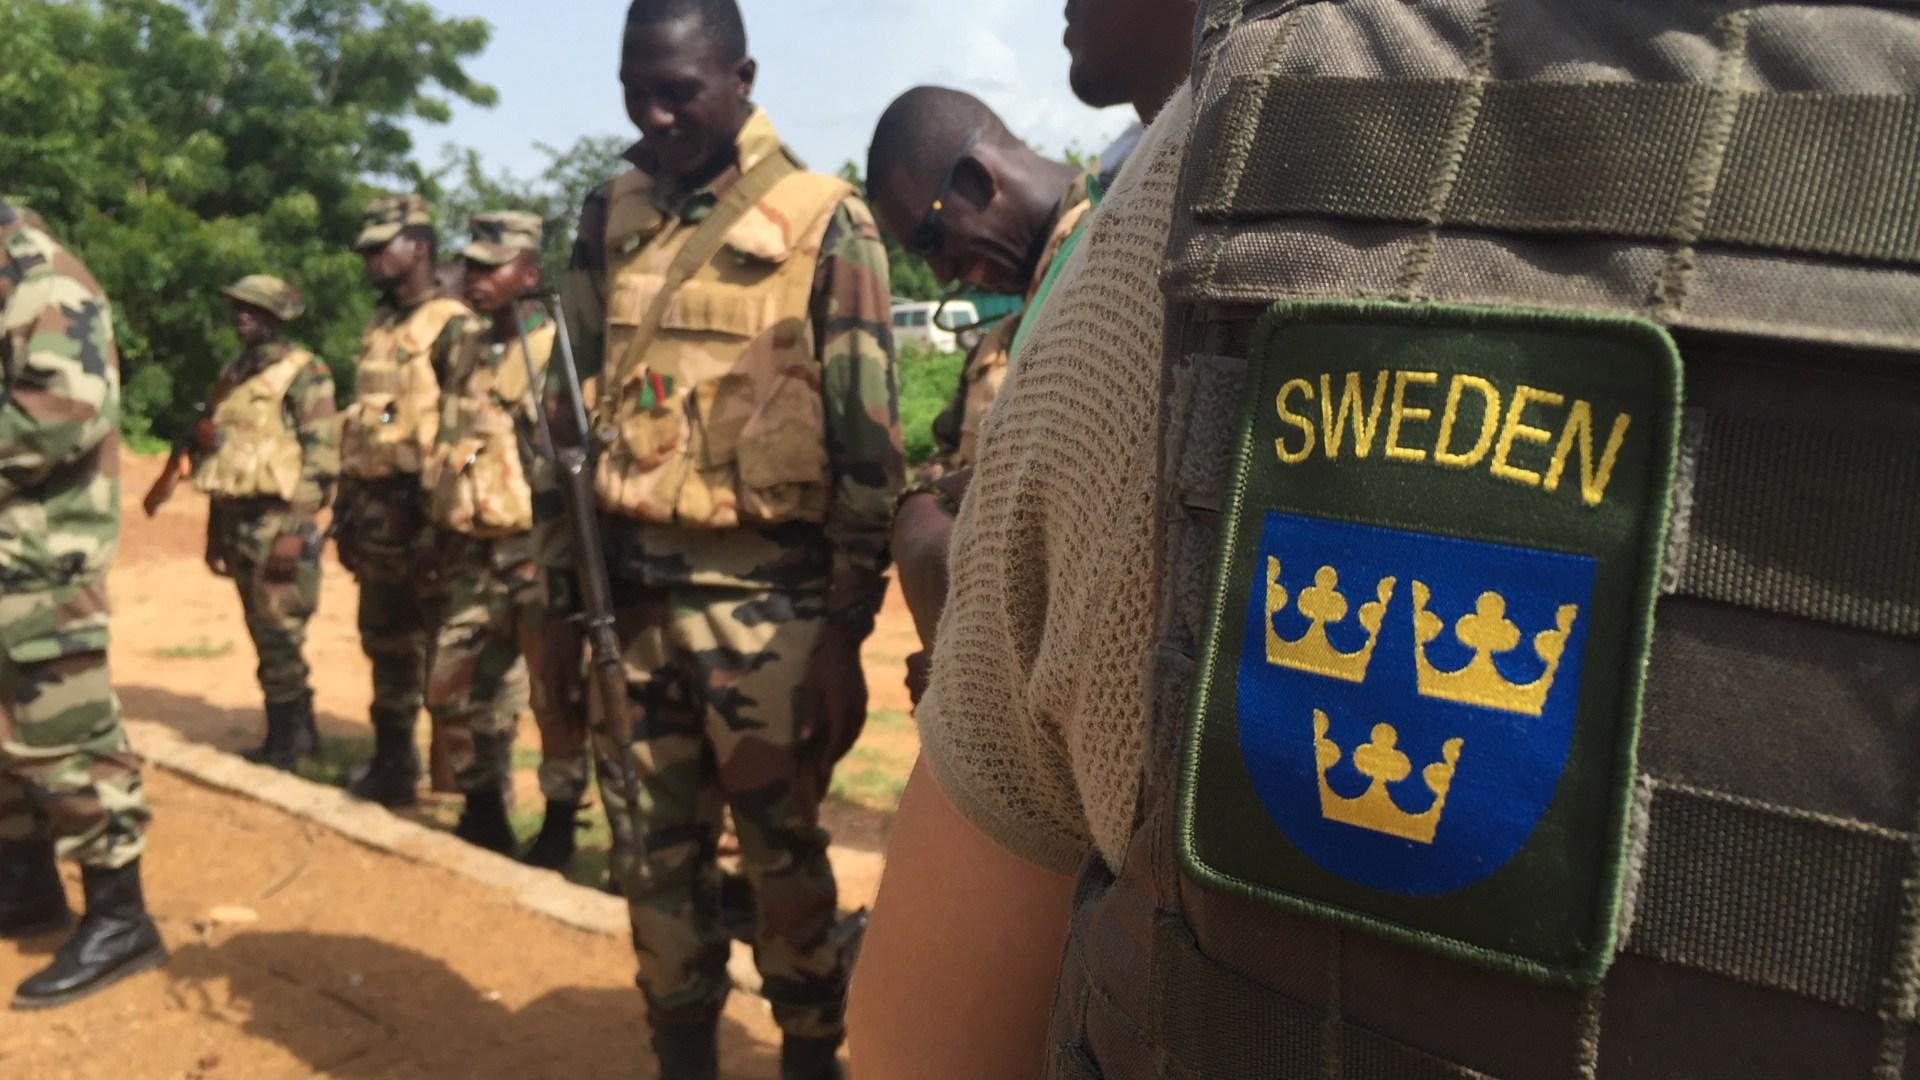 Sweden in Mali